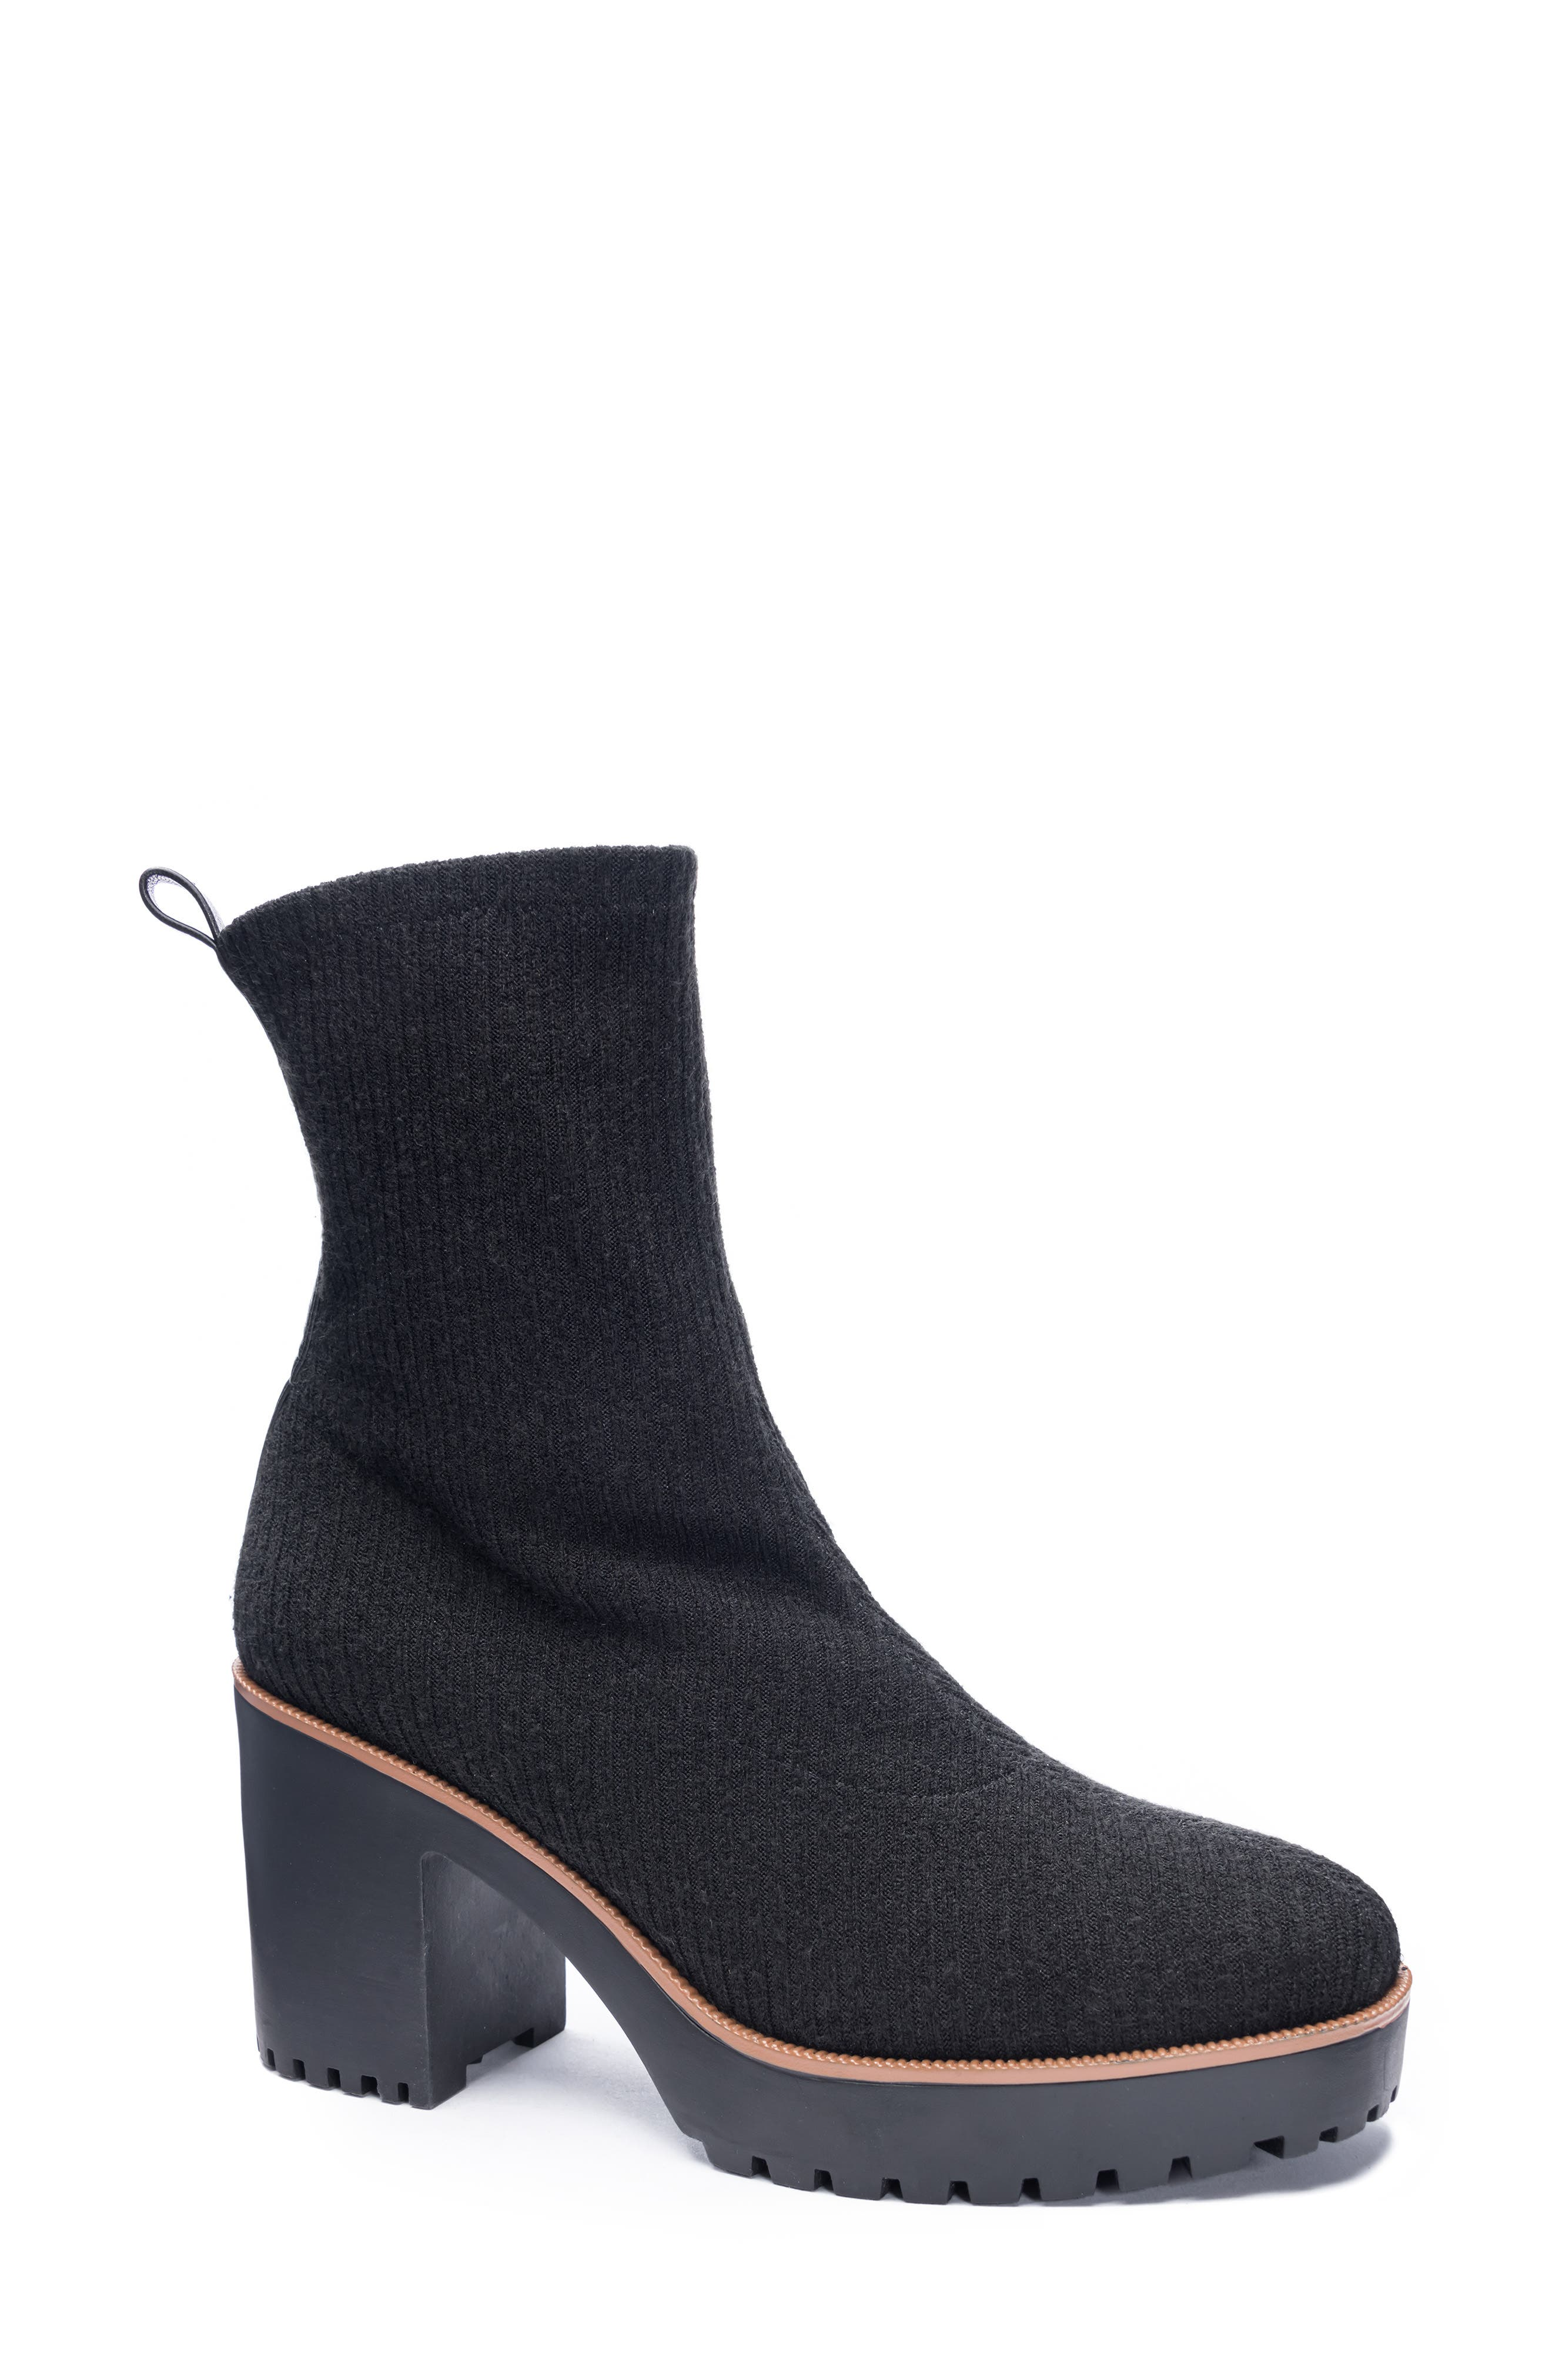 Garvey Knit Platform Bootie